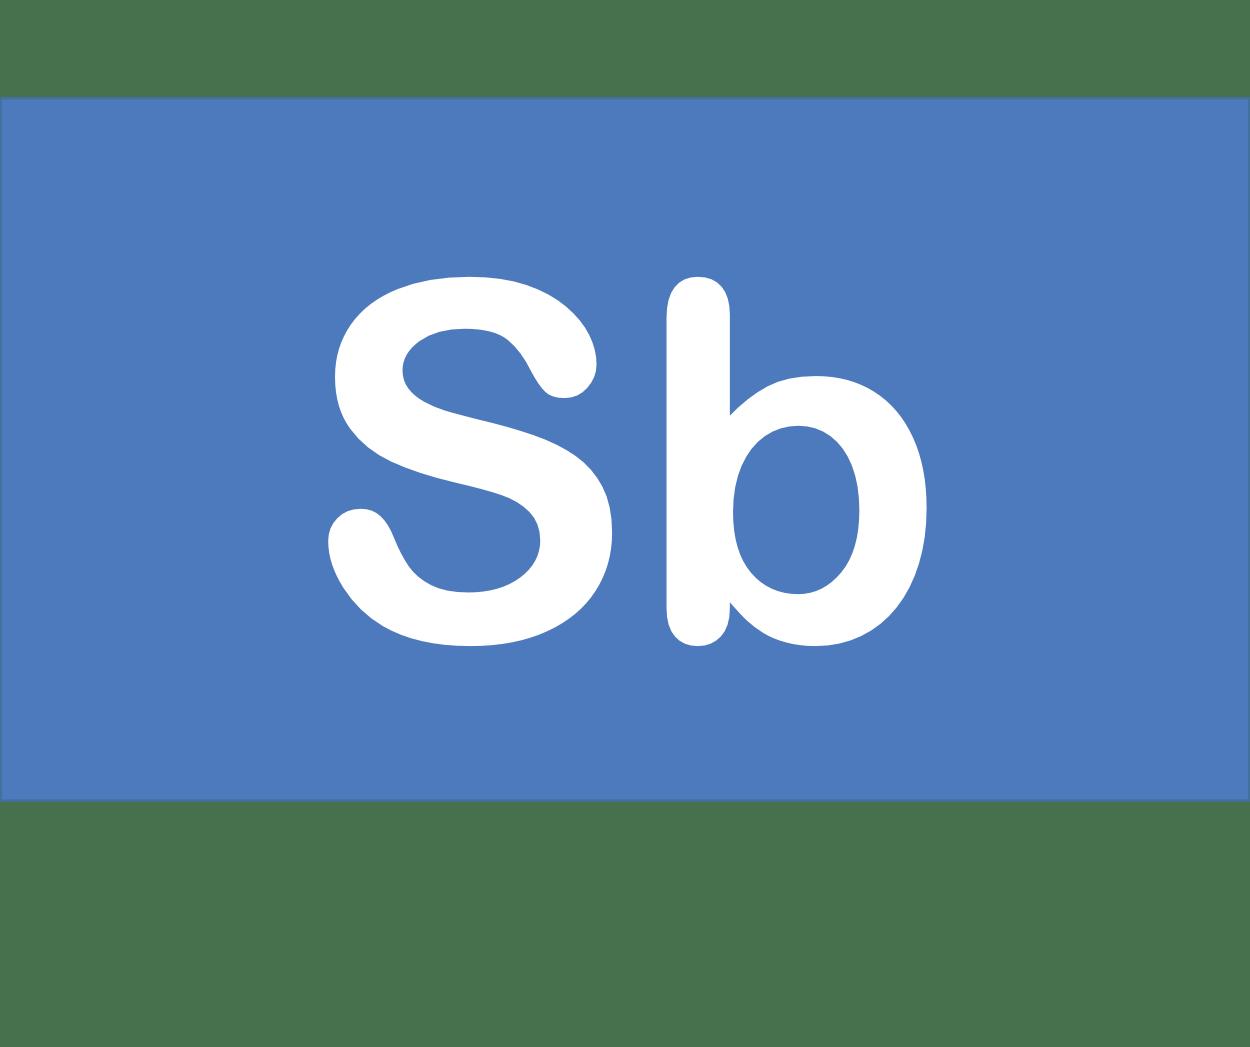 51 Sb アンチモン Antimony 元素 記号 周期表 化学 原子